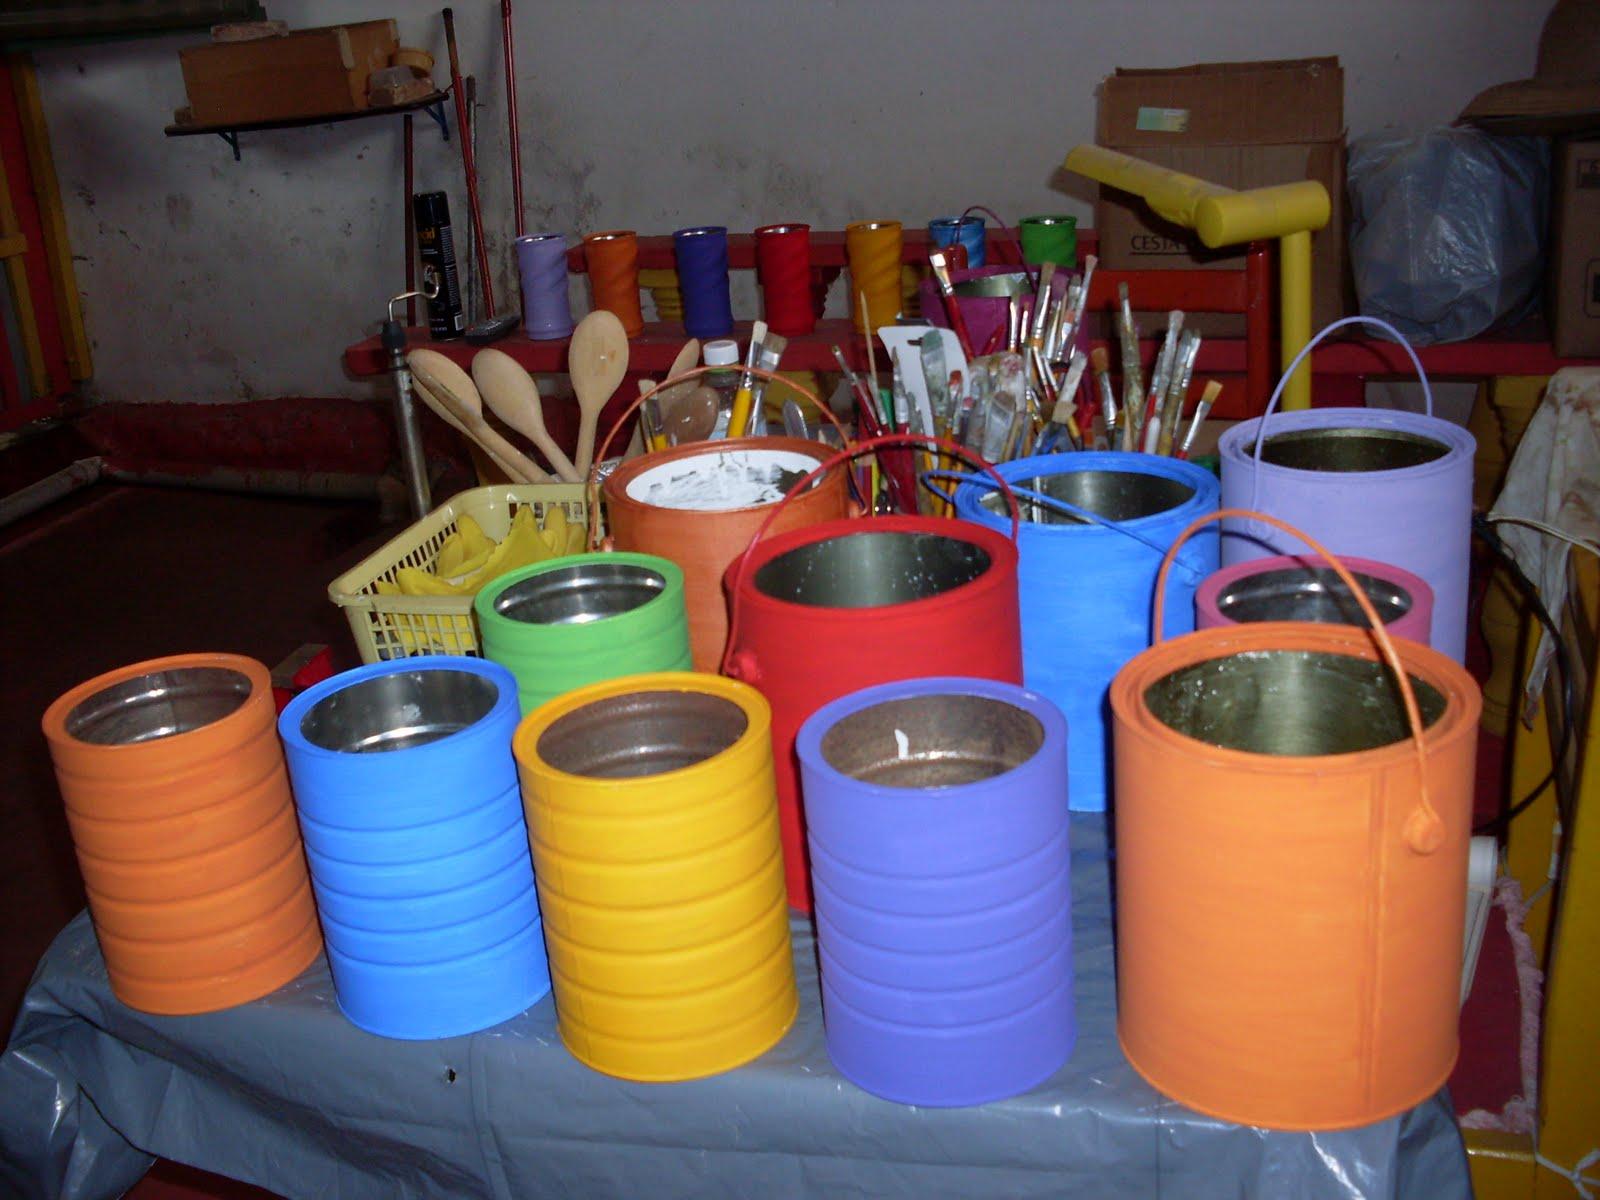 Crizartes pintura em latas de alum nio - Pintura para aluminio ...